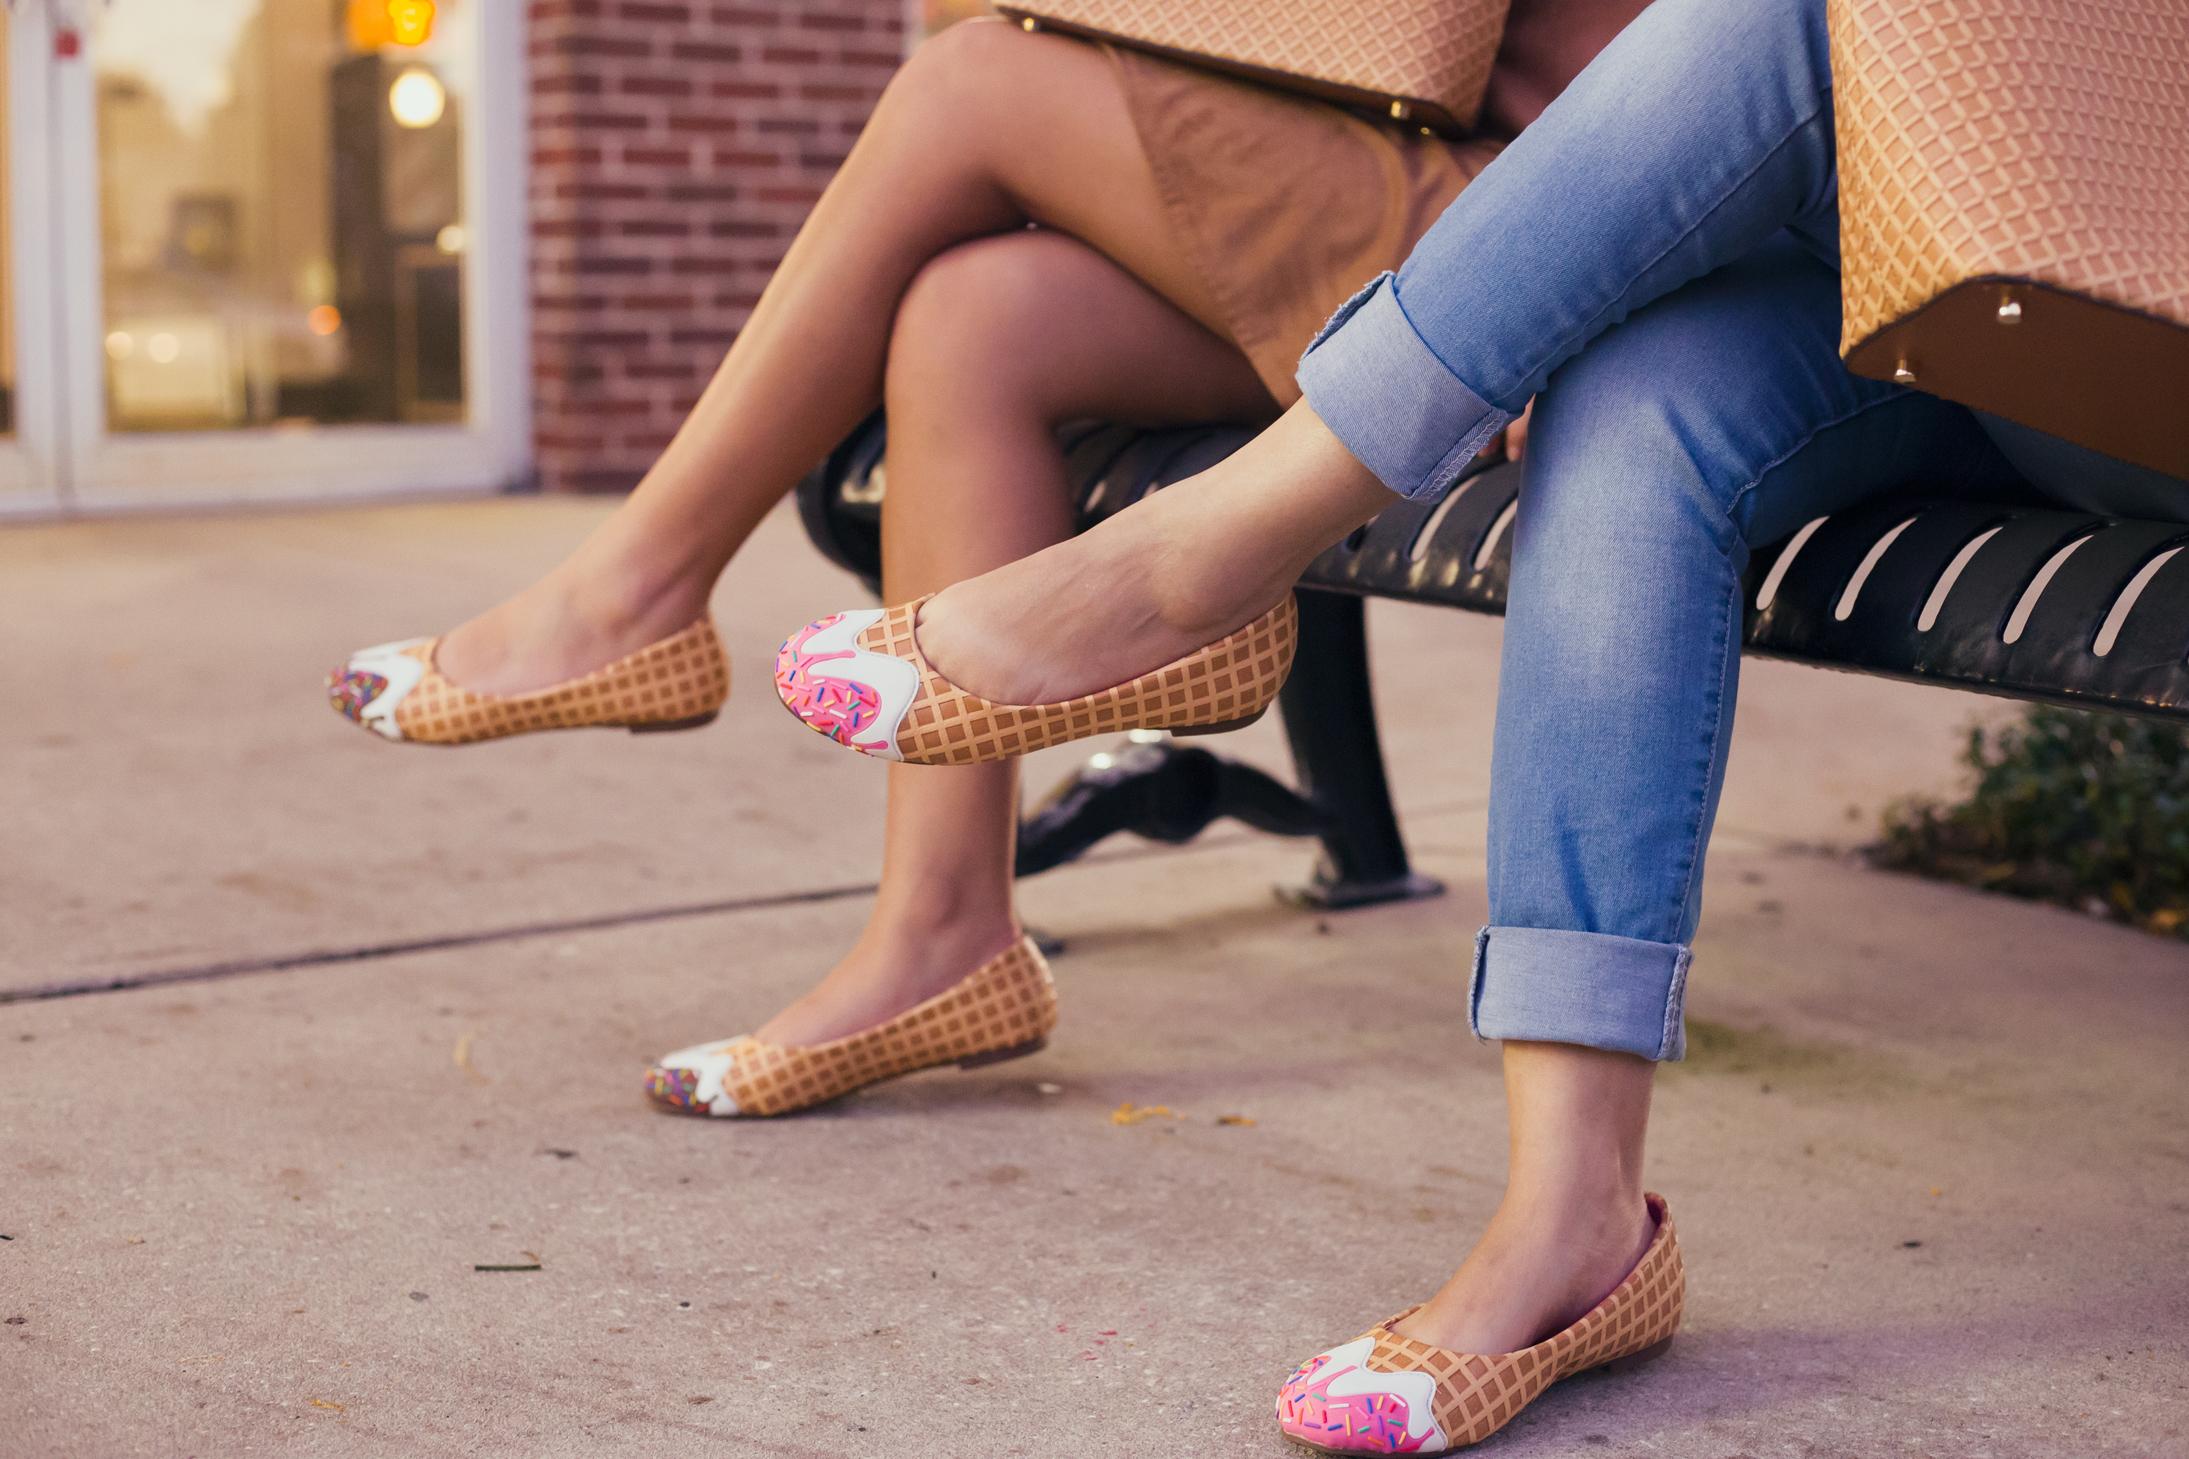 shoe-bakery-waffle-flats-chamber-photography-moments-antoine-hart-7.jpg